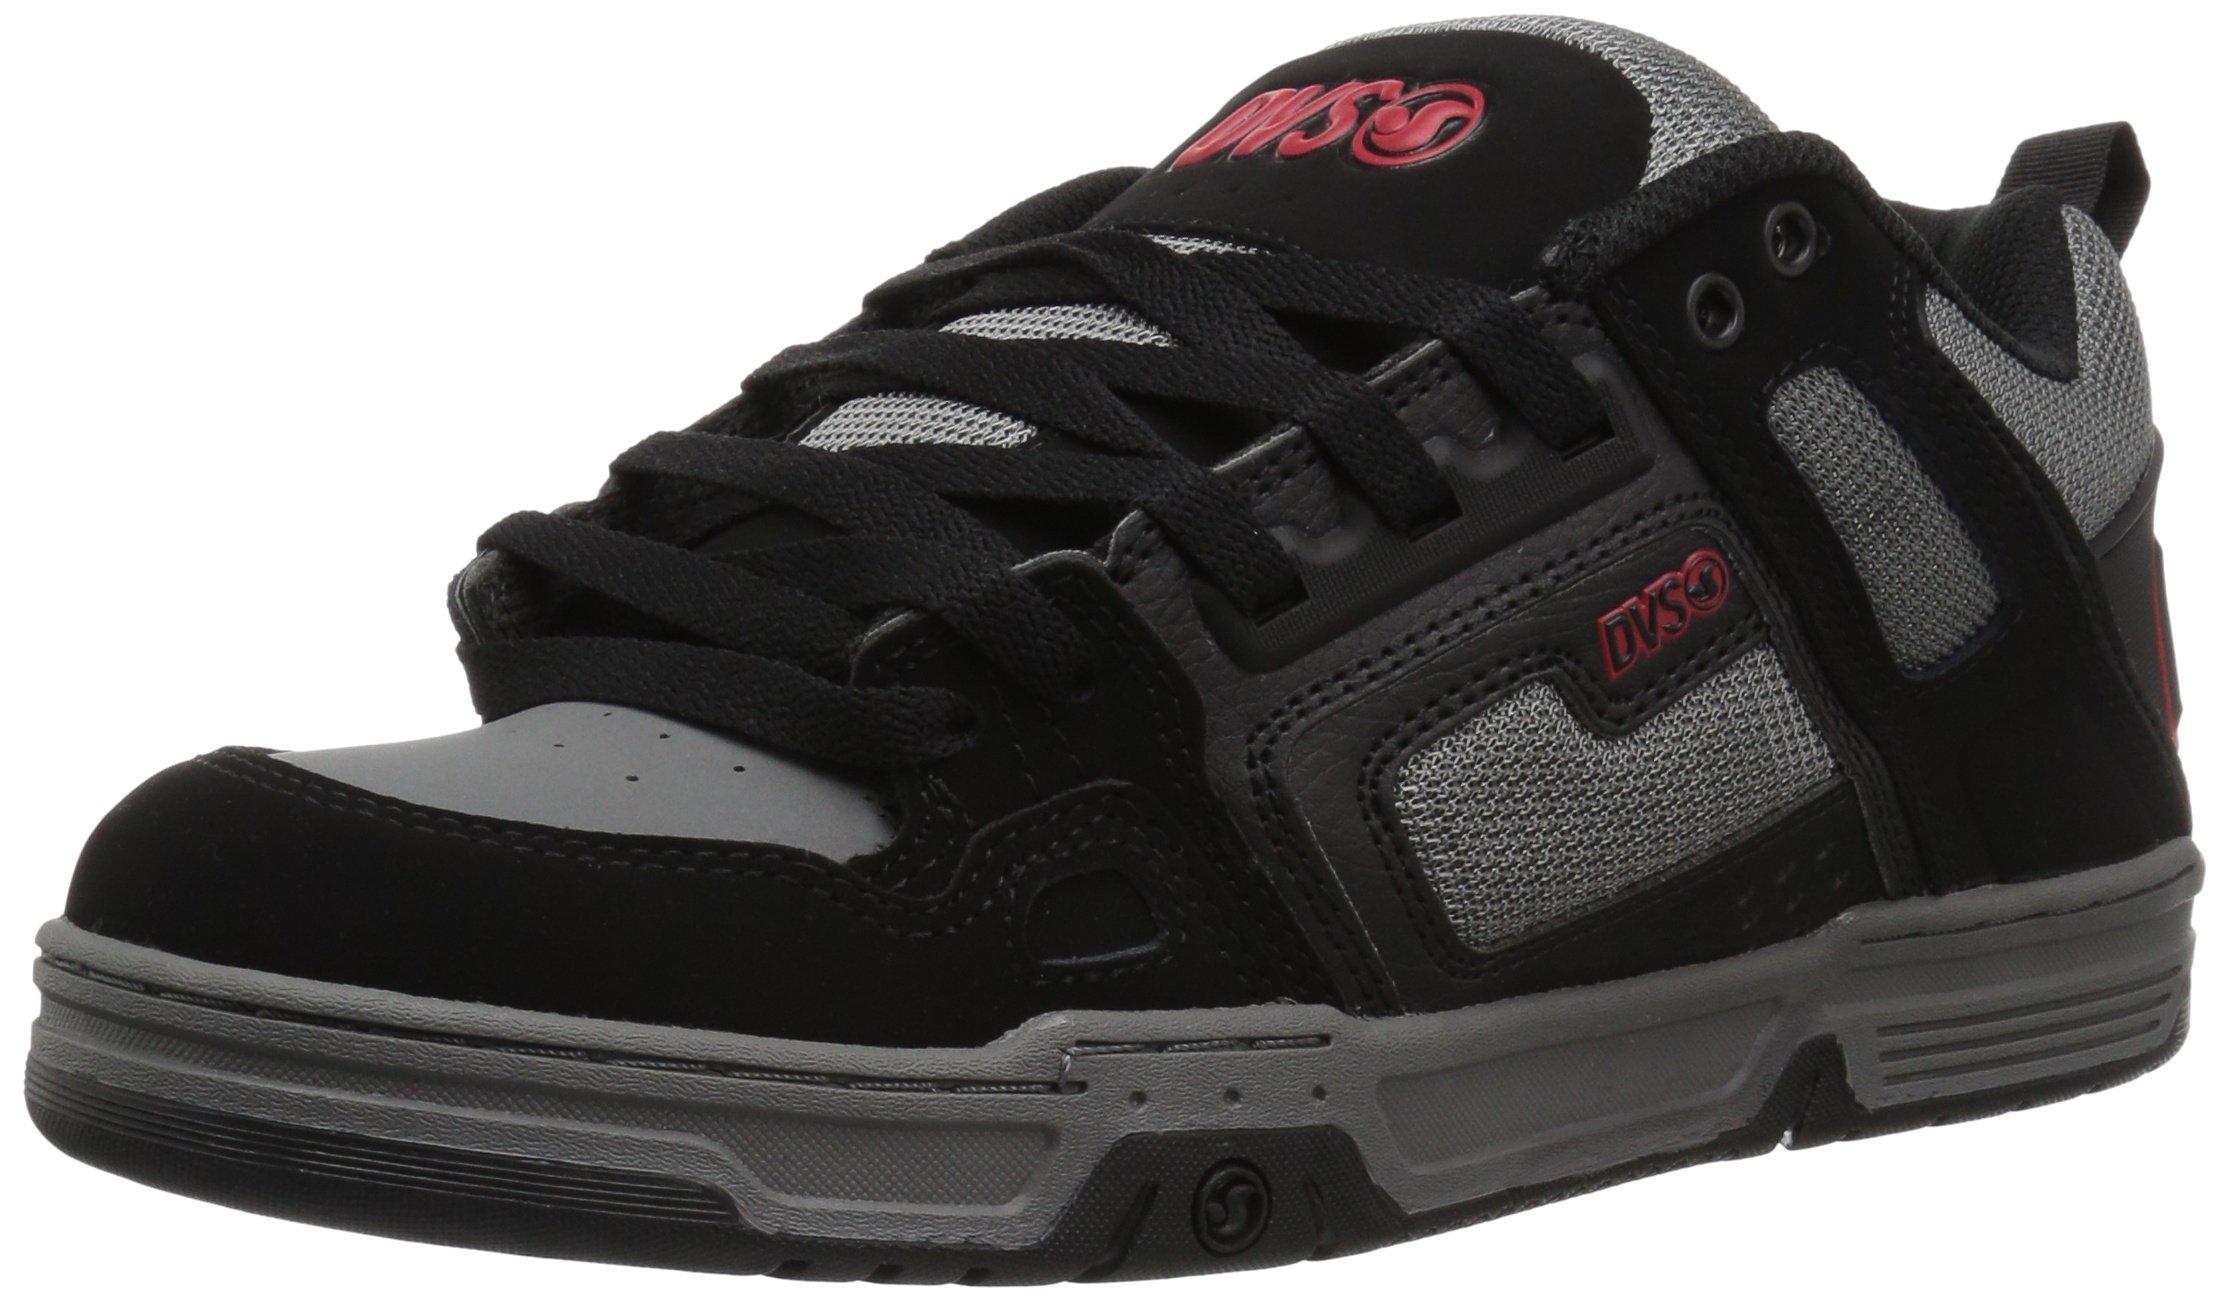 DVS Men's Comanche Skate Shoe, Black Charcoal Leather Nubuck, 7.5 Medium US